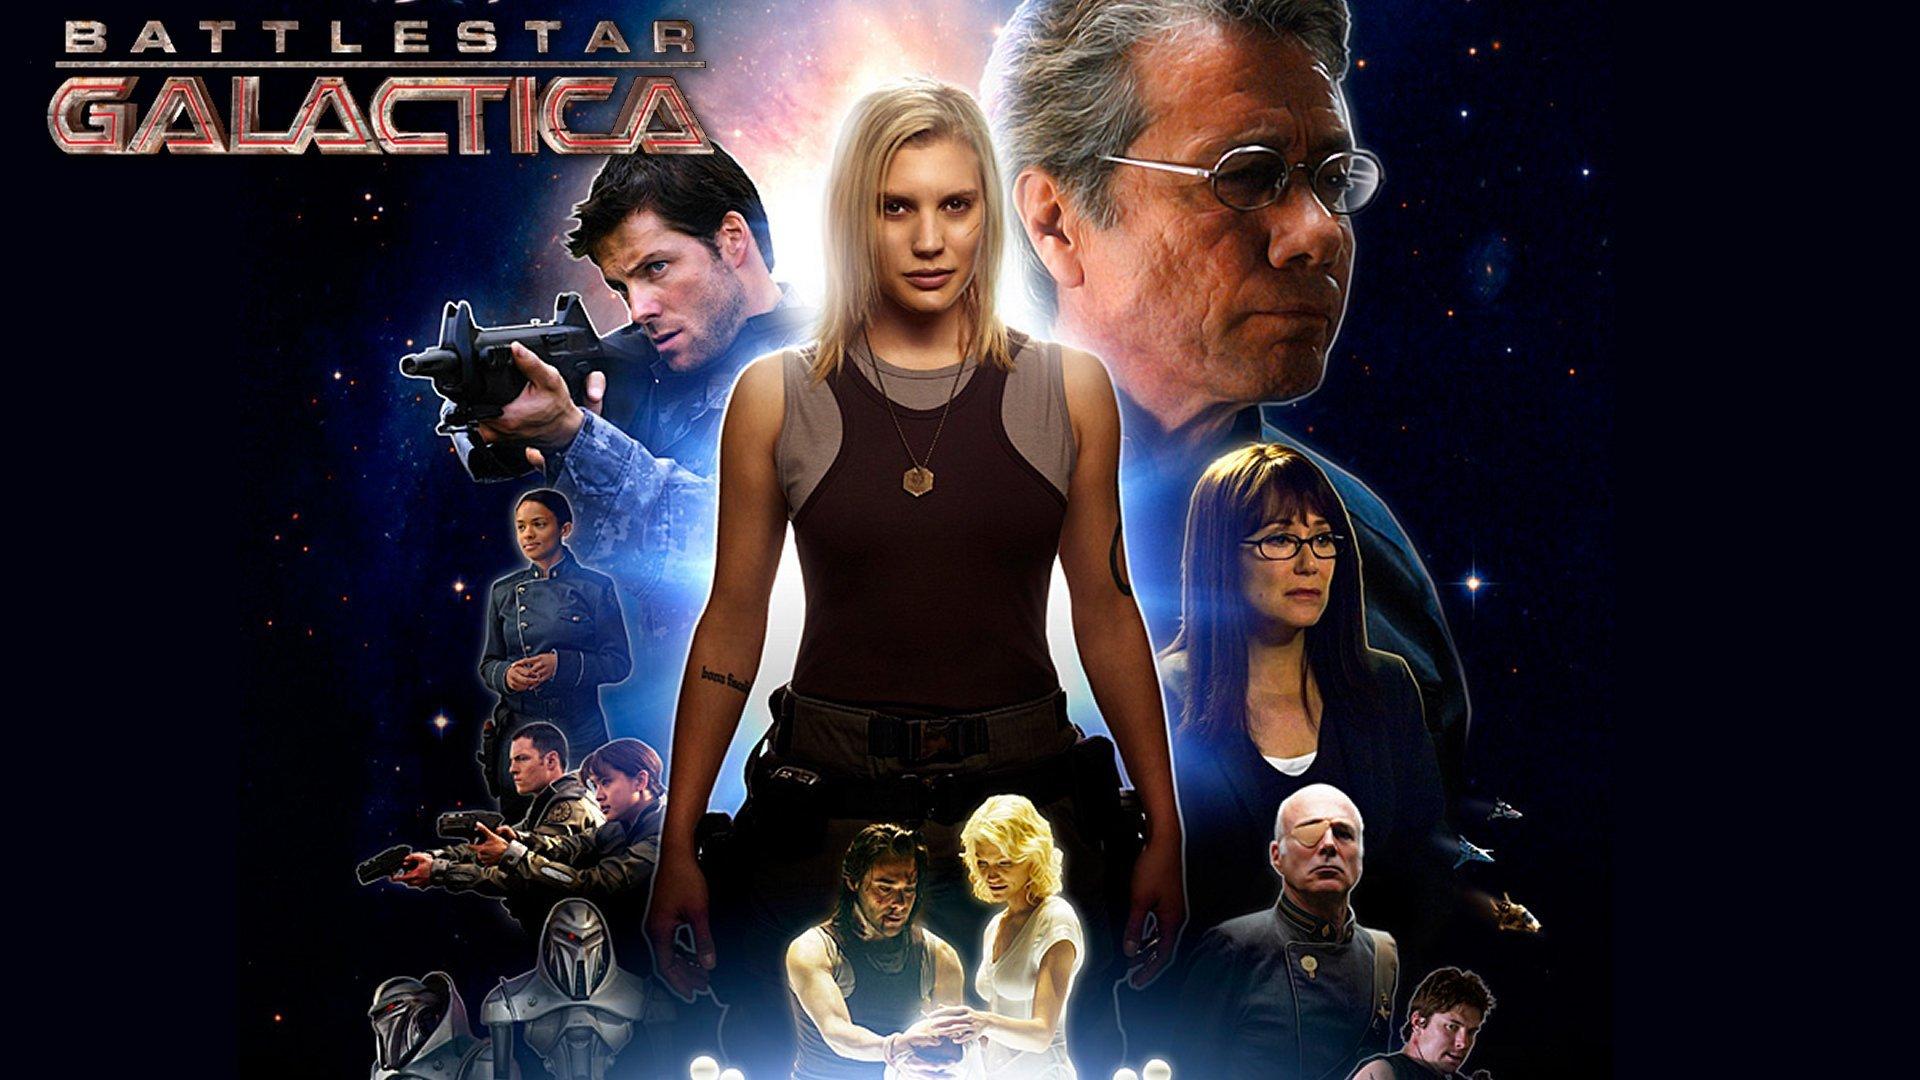 Battlestar-Galactica.jpg